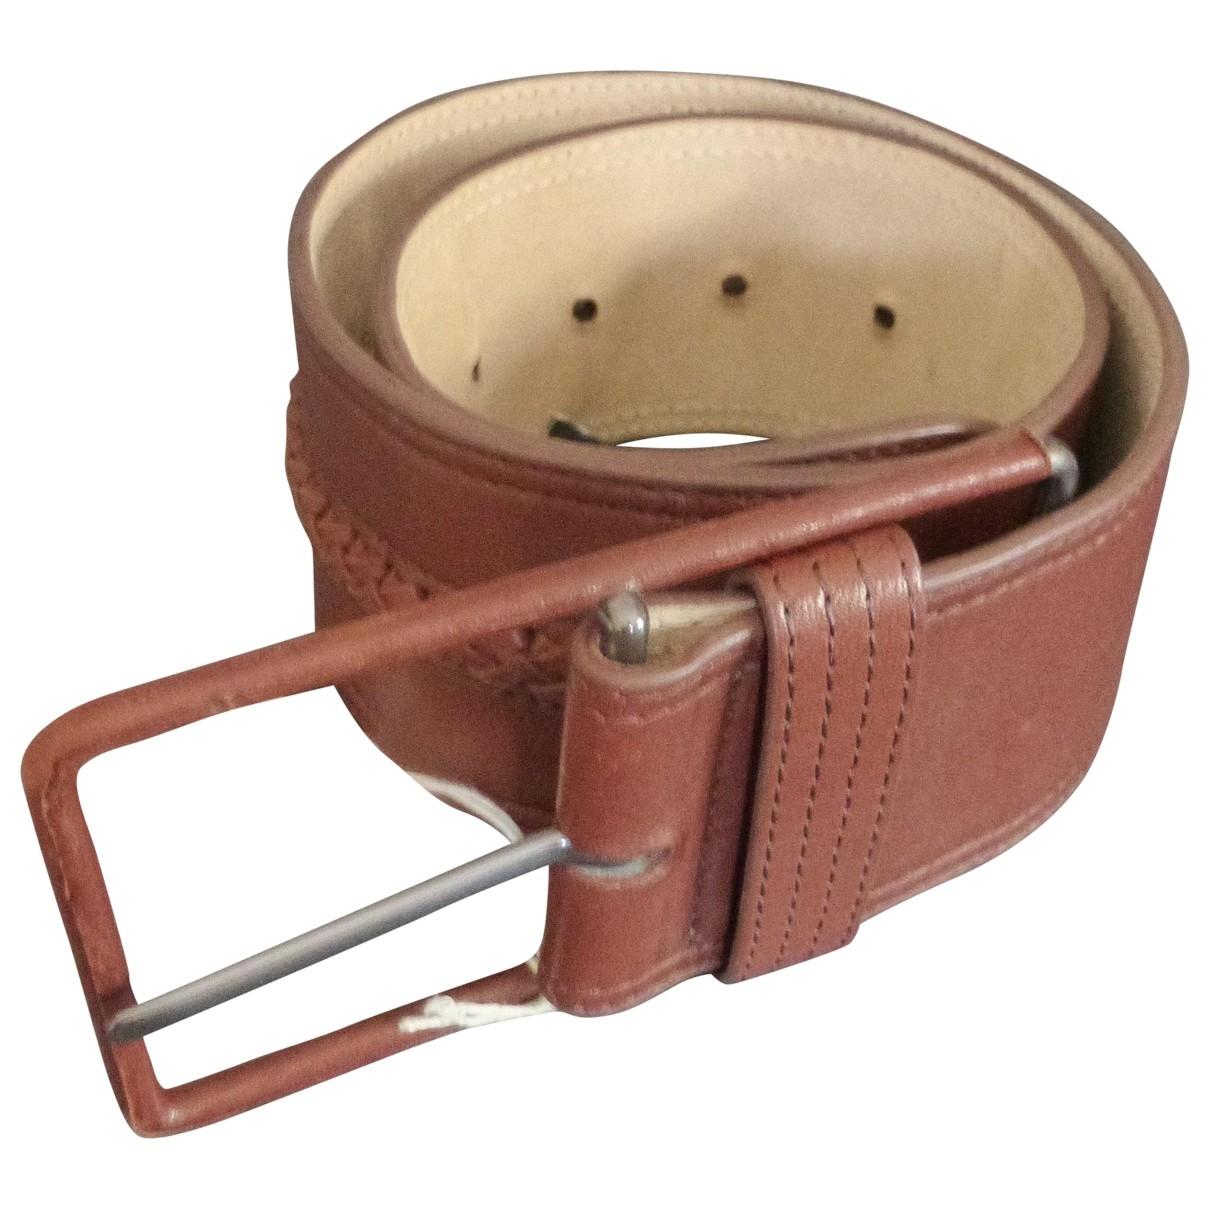 3.1 Phillip Lim \N Brown Leather belt for Women S International